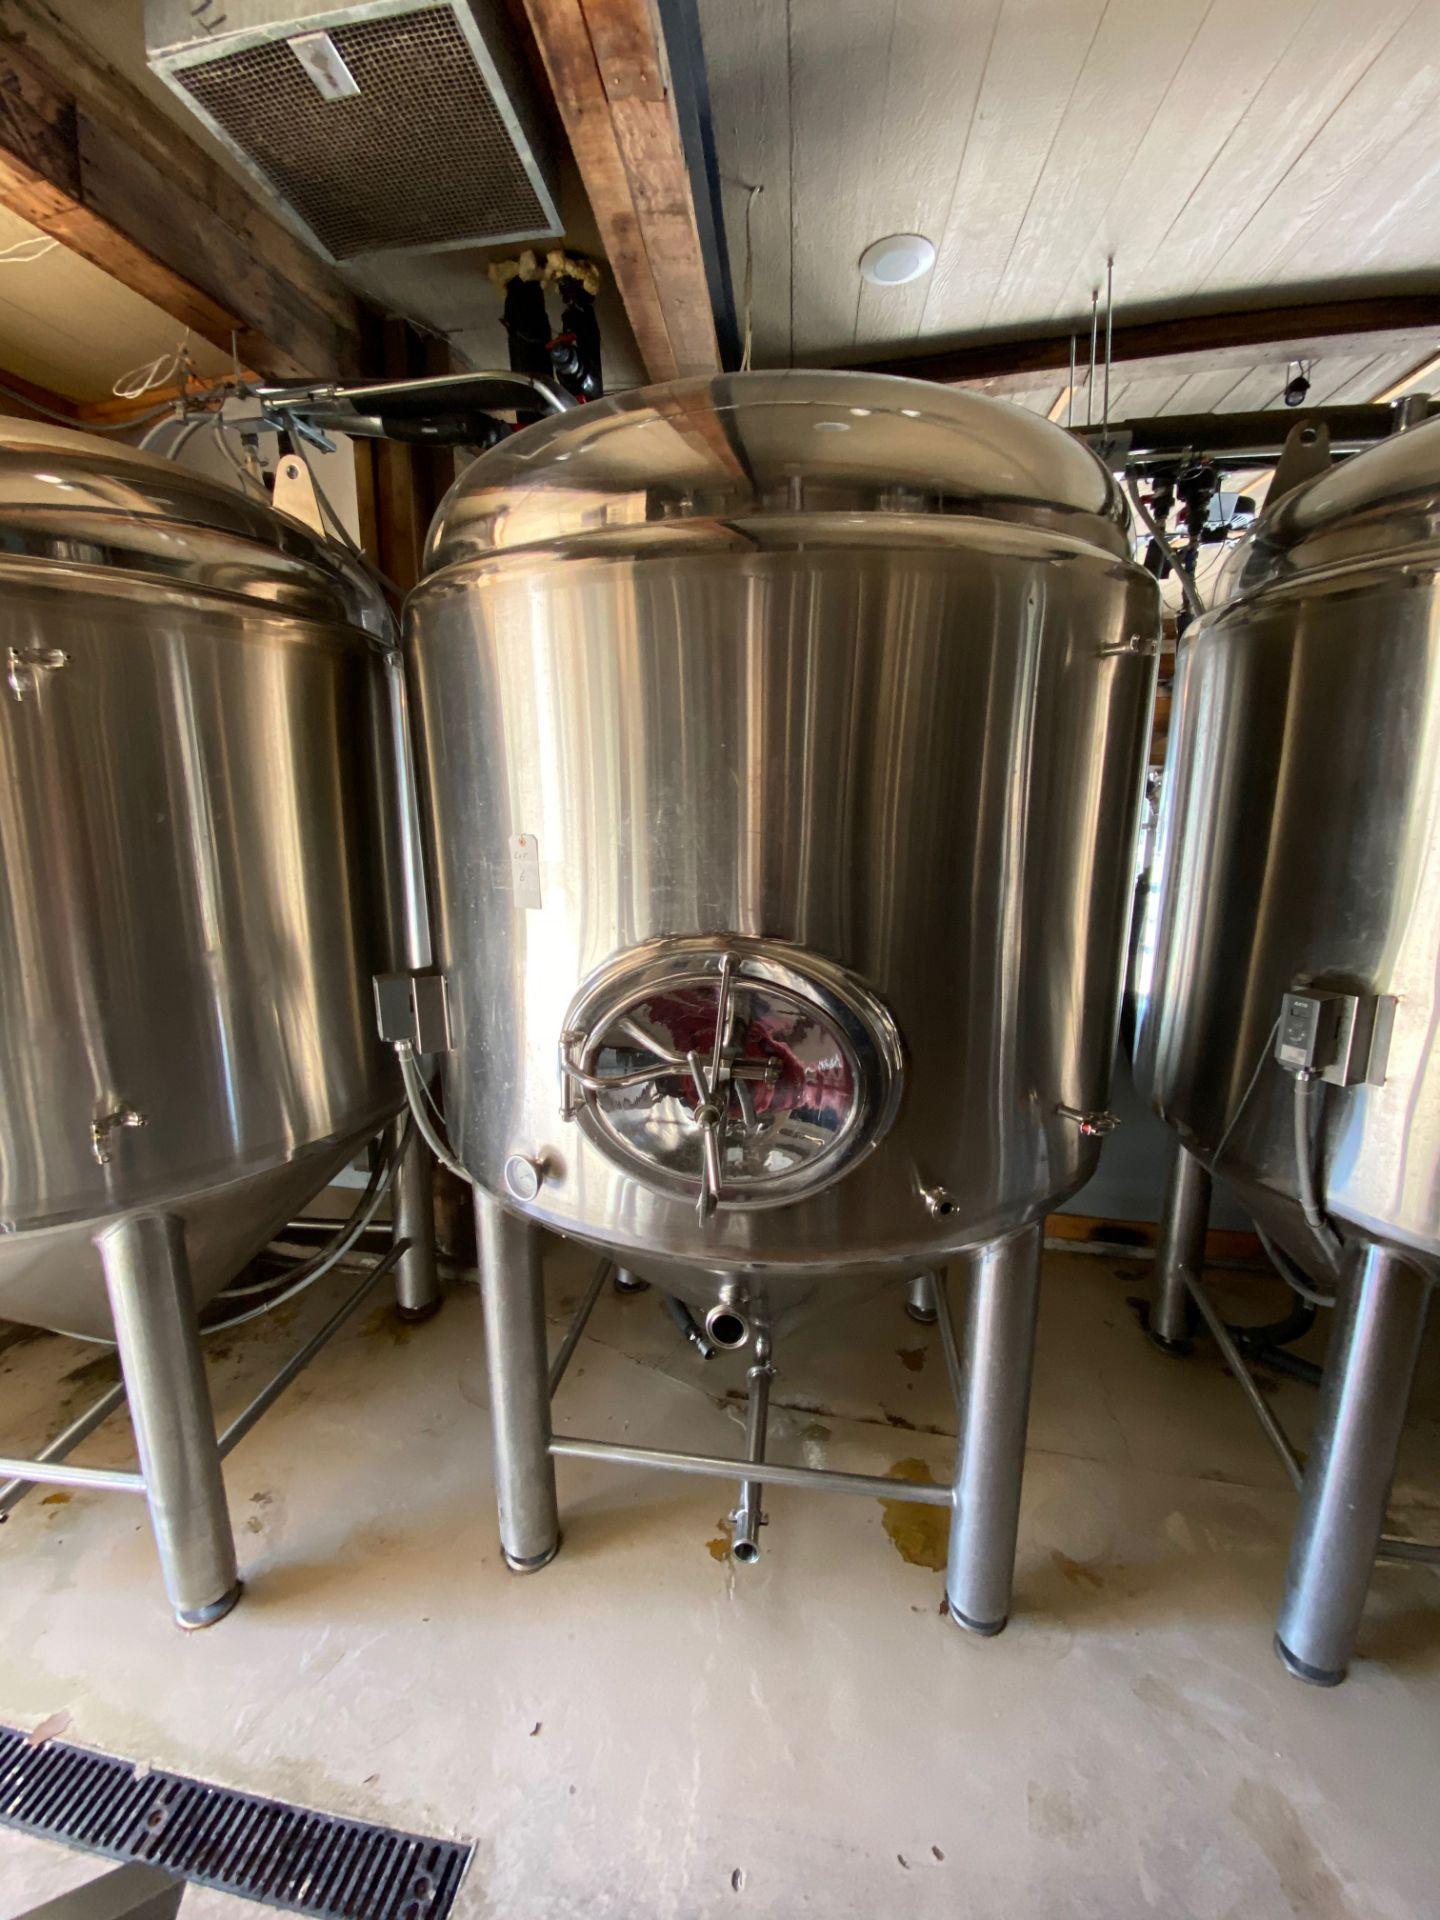 Lot 6 - 2014 Criveller 20 BBL Fermentation Vessel, 304 Stainless Steel, Sidew | Sub to Bulk | Rig Fee: $500